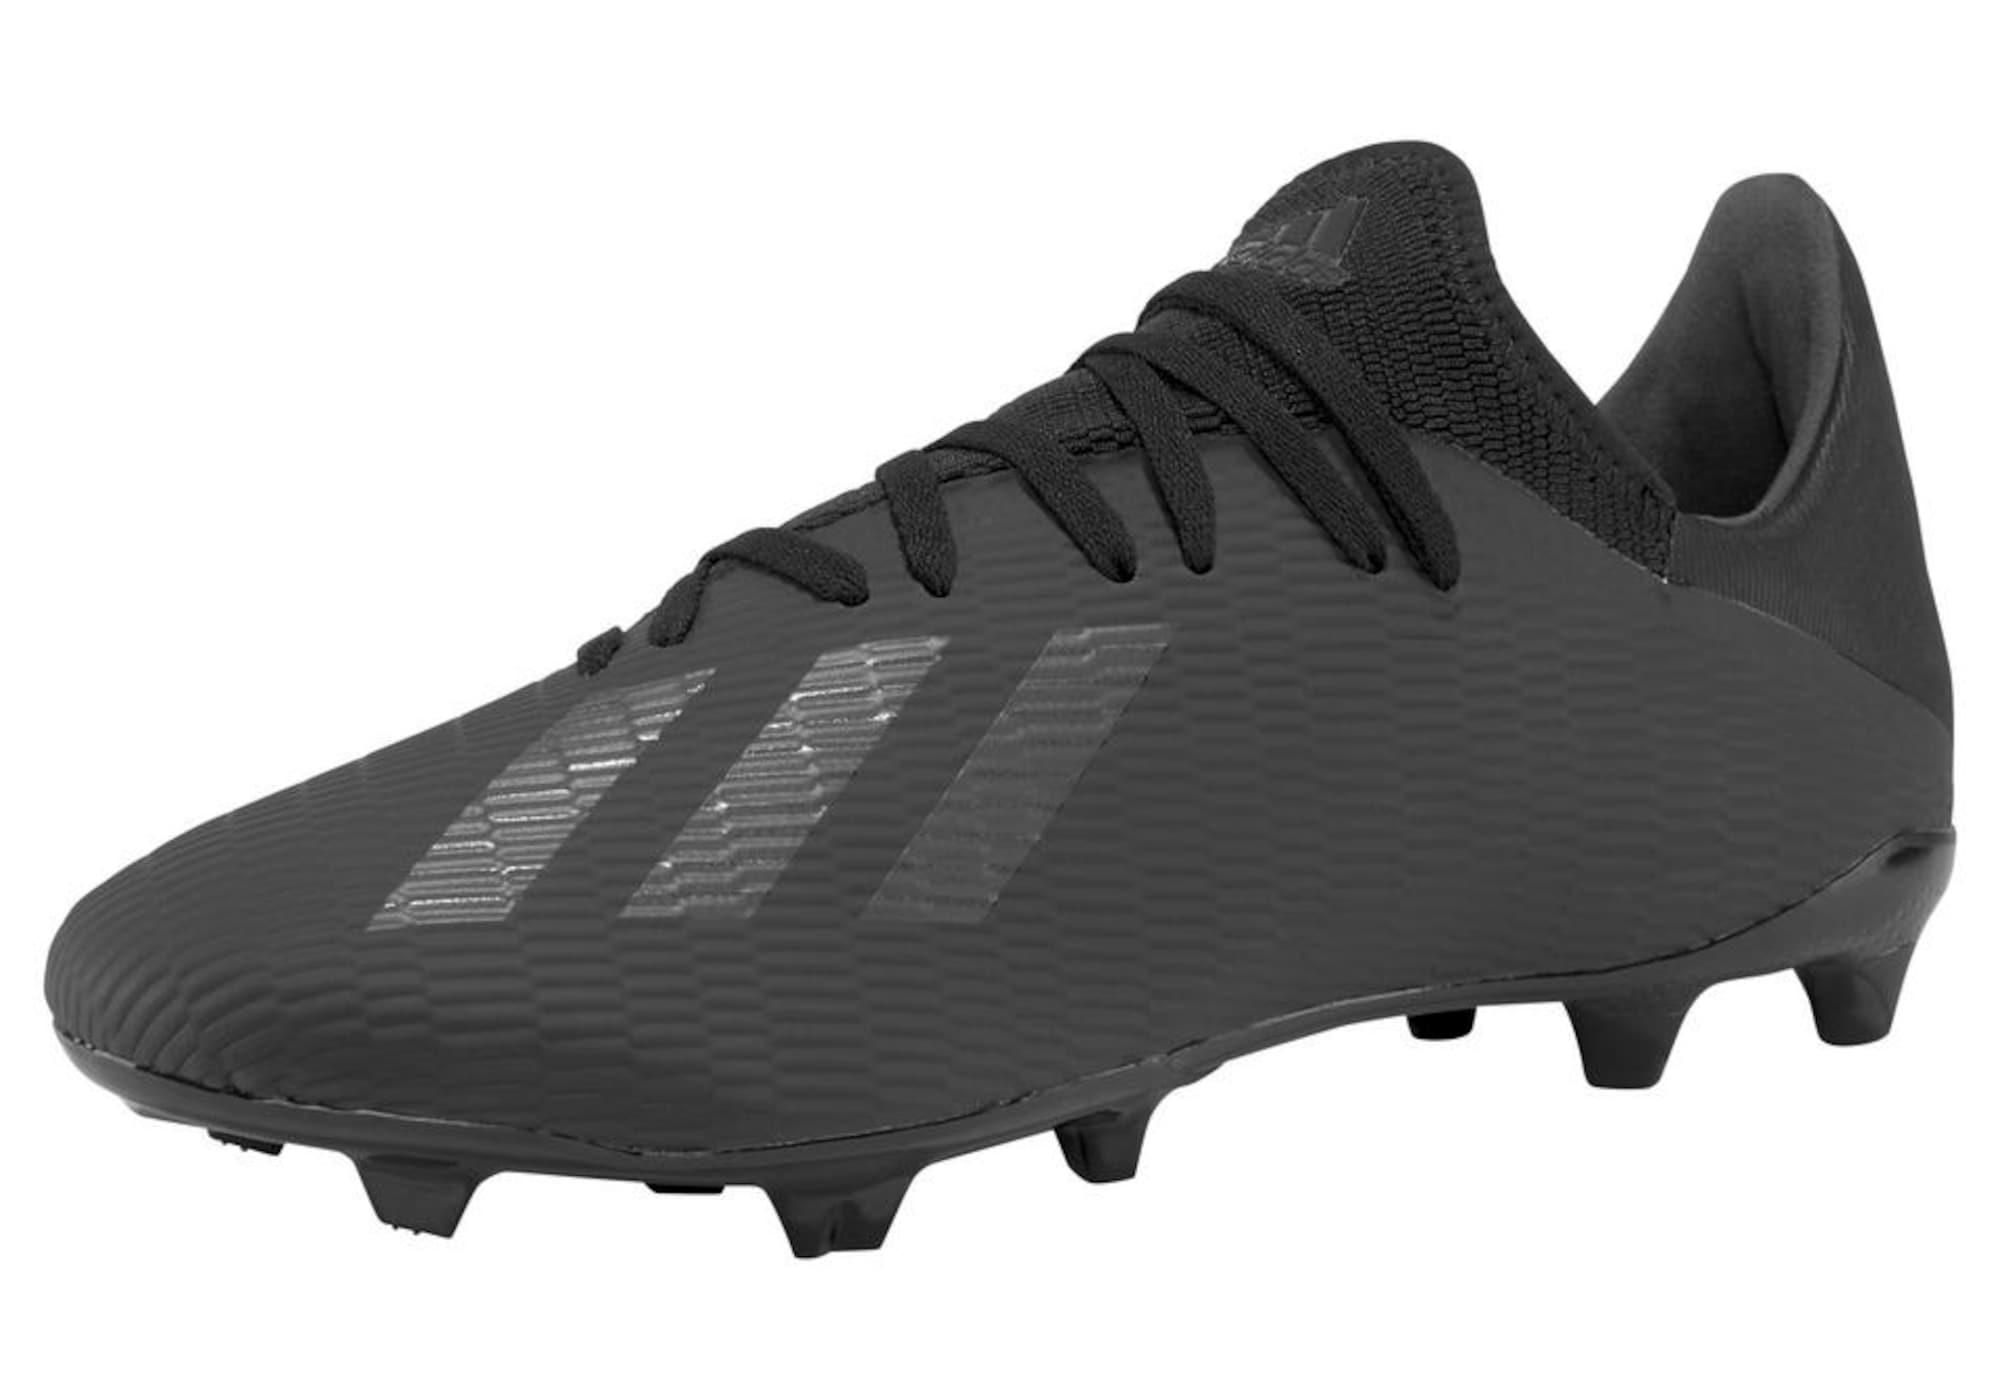 Fußballschuh 'X 19.3' | Schuhe > Sportschuhe > Fußballschuhe | adidas performance